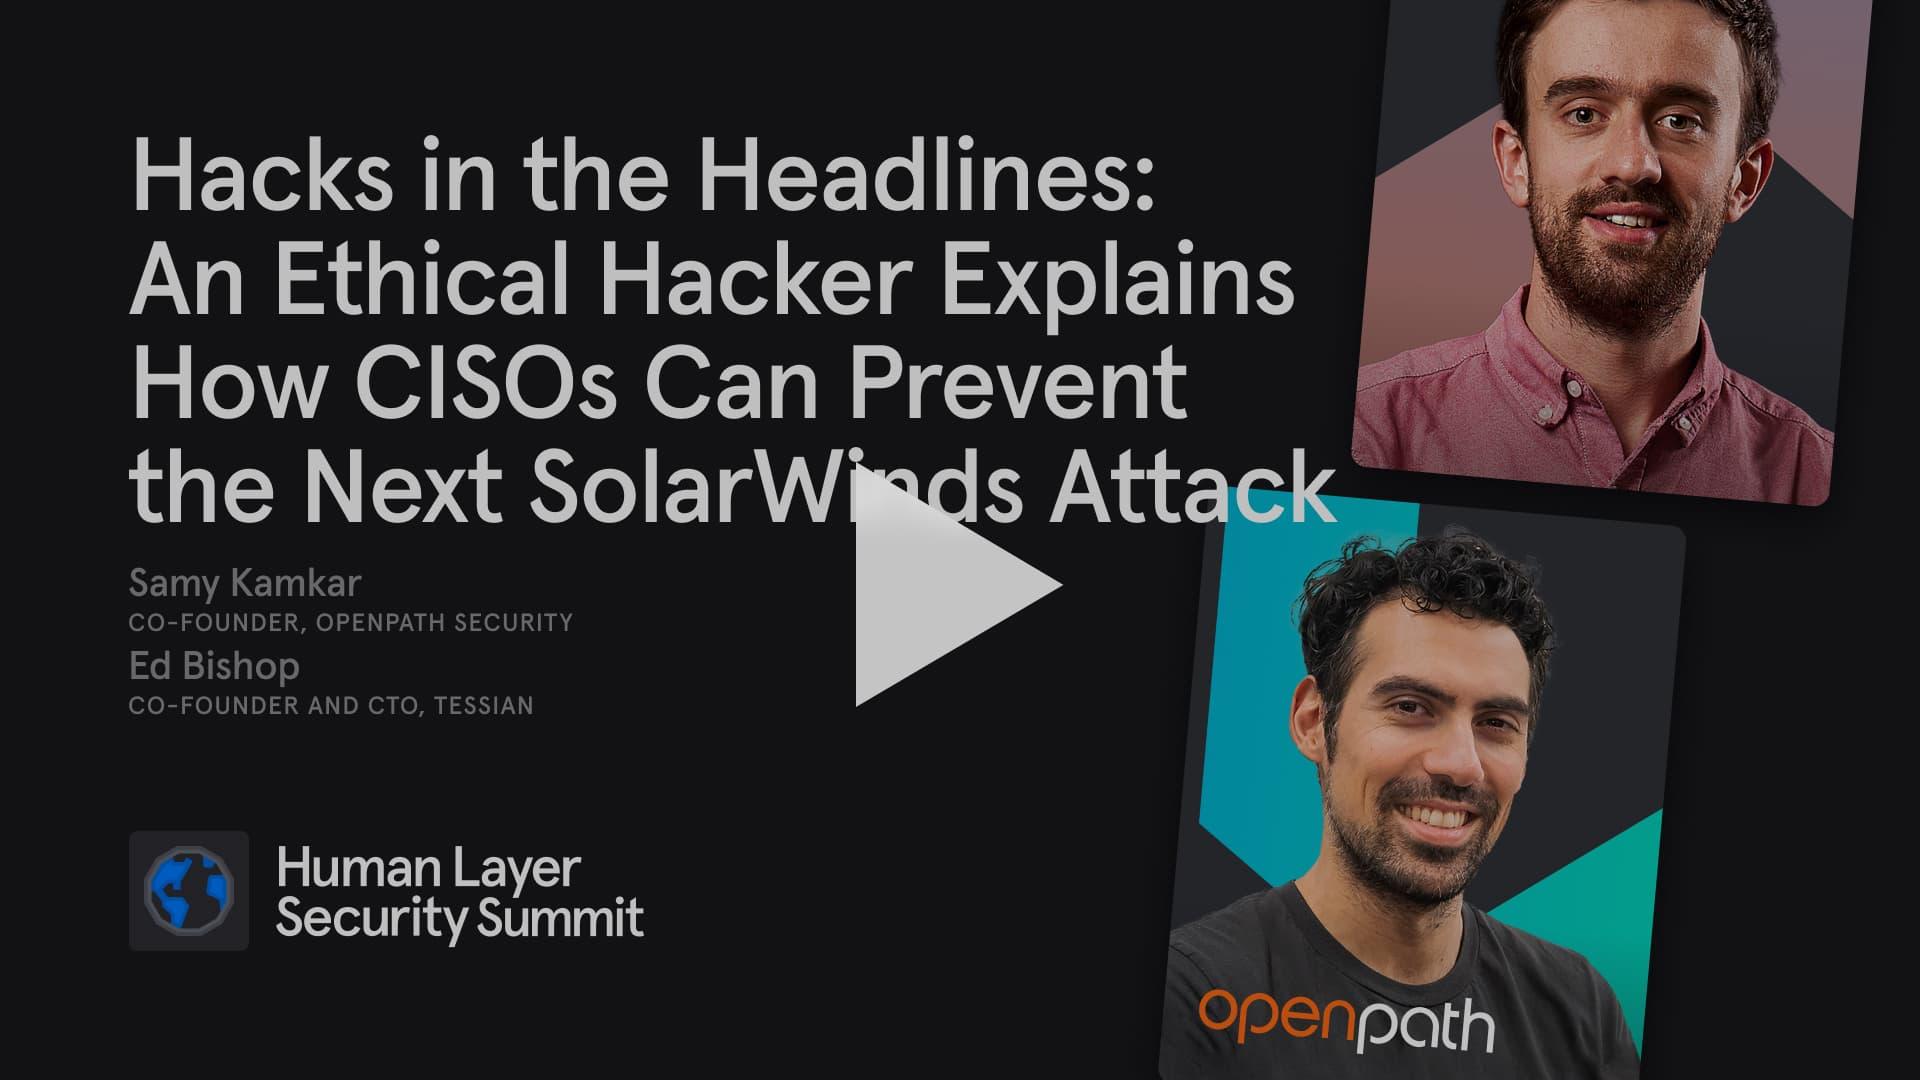 [Marketing][HLS-OD] Hacks-in-Headlines